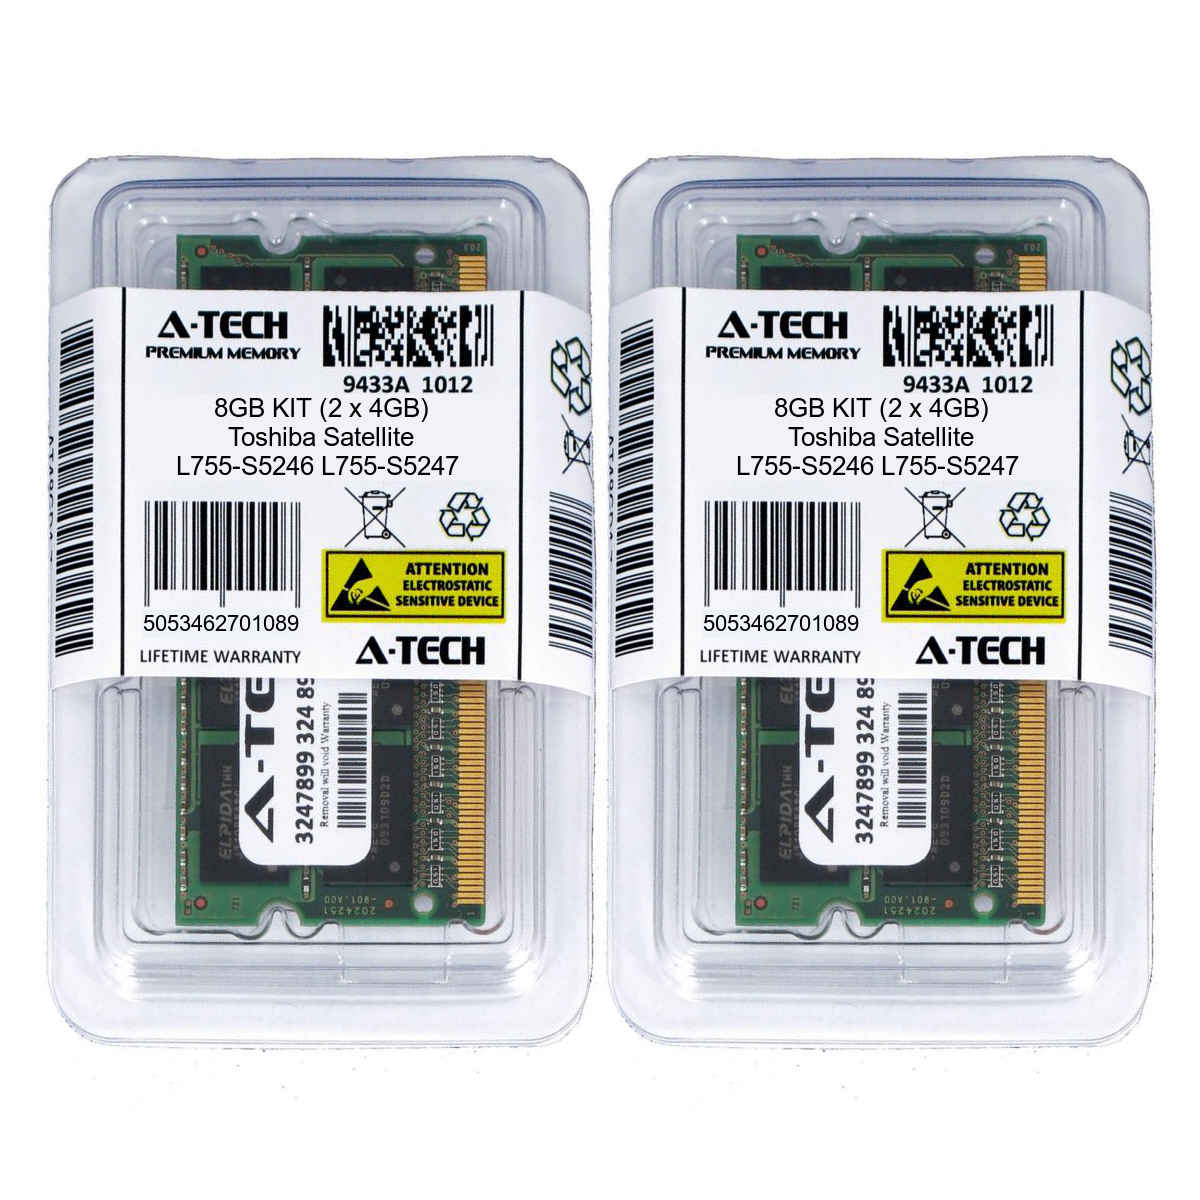 8GB KIT 2 x 4GB Toshiba Satellite L755-S5244 L755-S5245 L755-S5246 Ram Memory